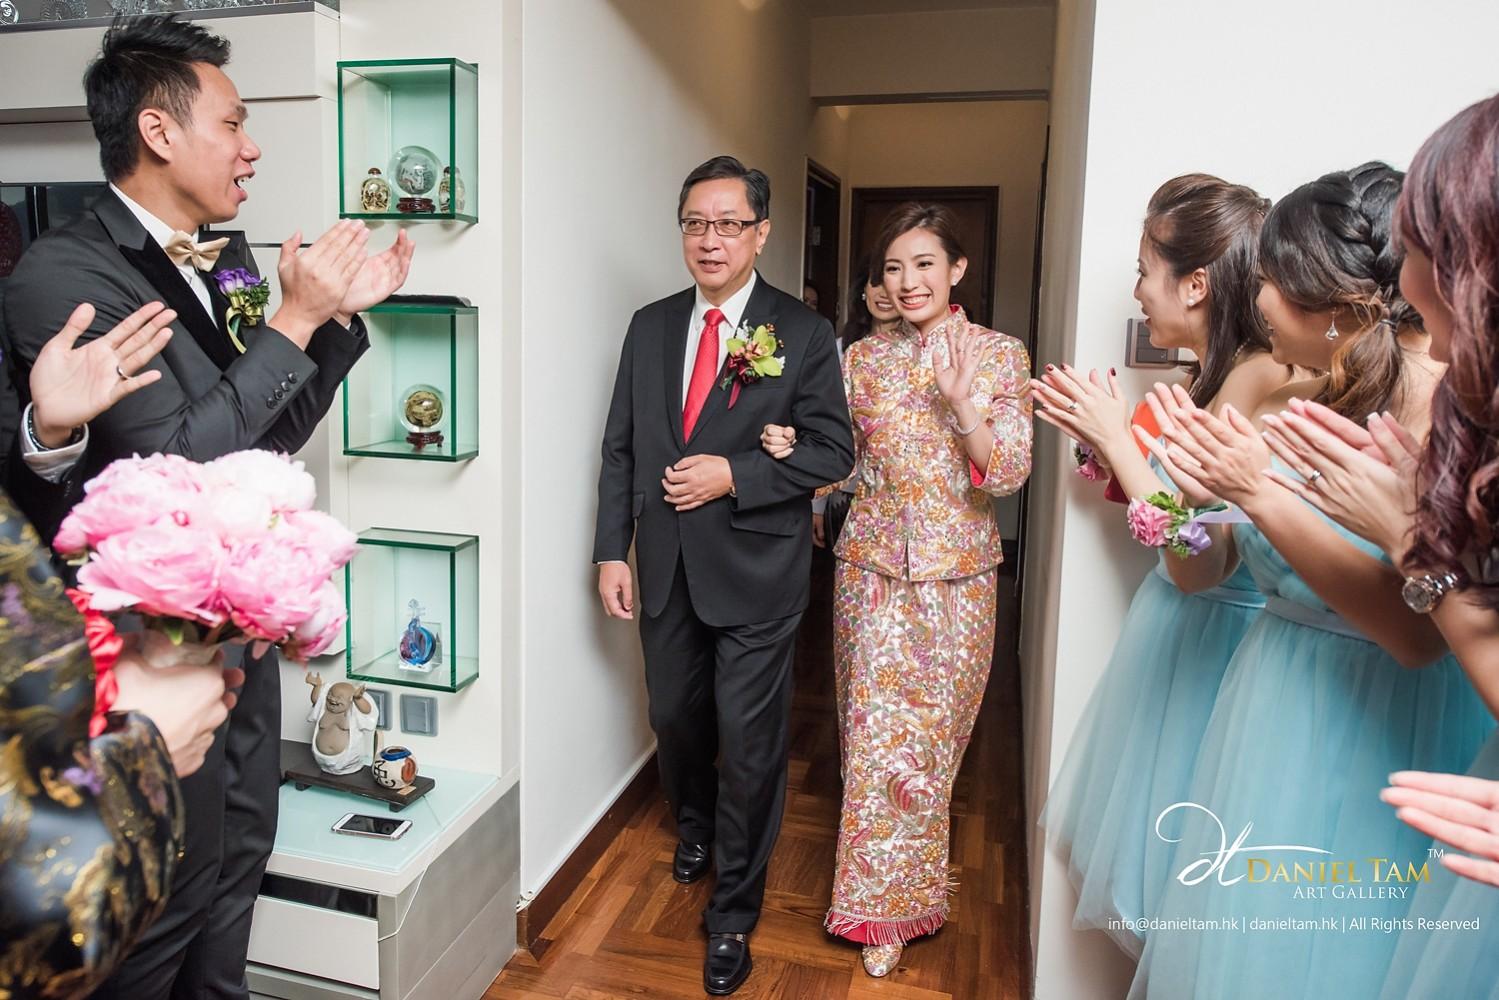 wedding-day-photography-hk-four-seasons-jessica-erik-01wedding-day-photography-hk-four-seasons-jessica-erik-06